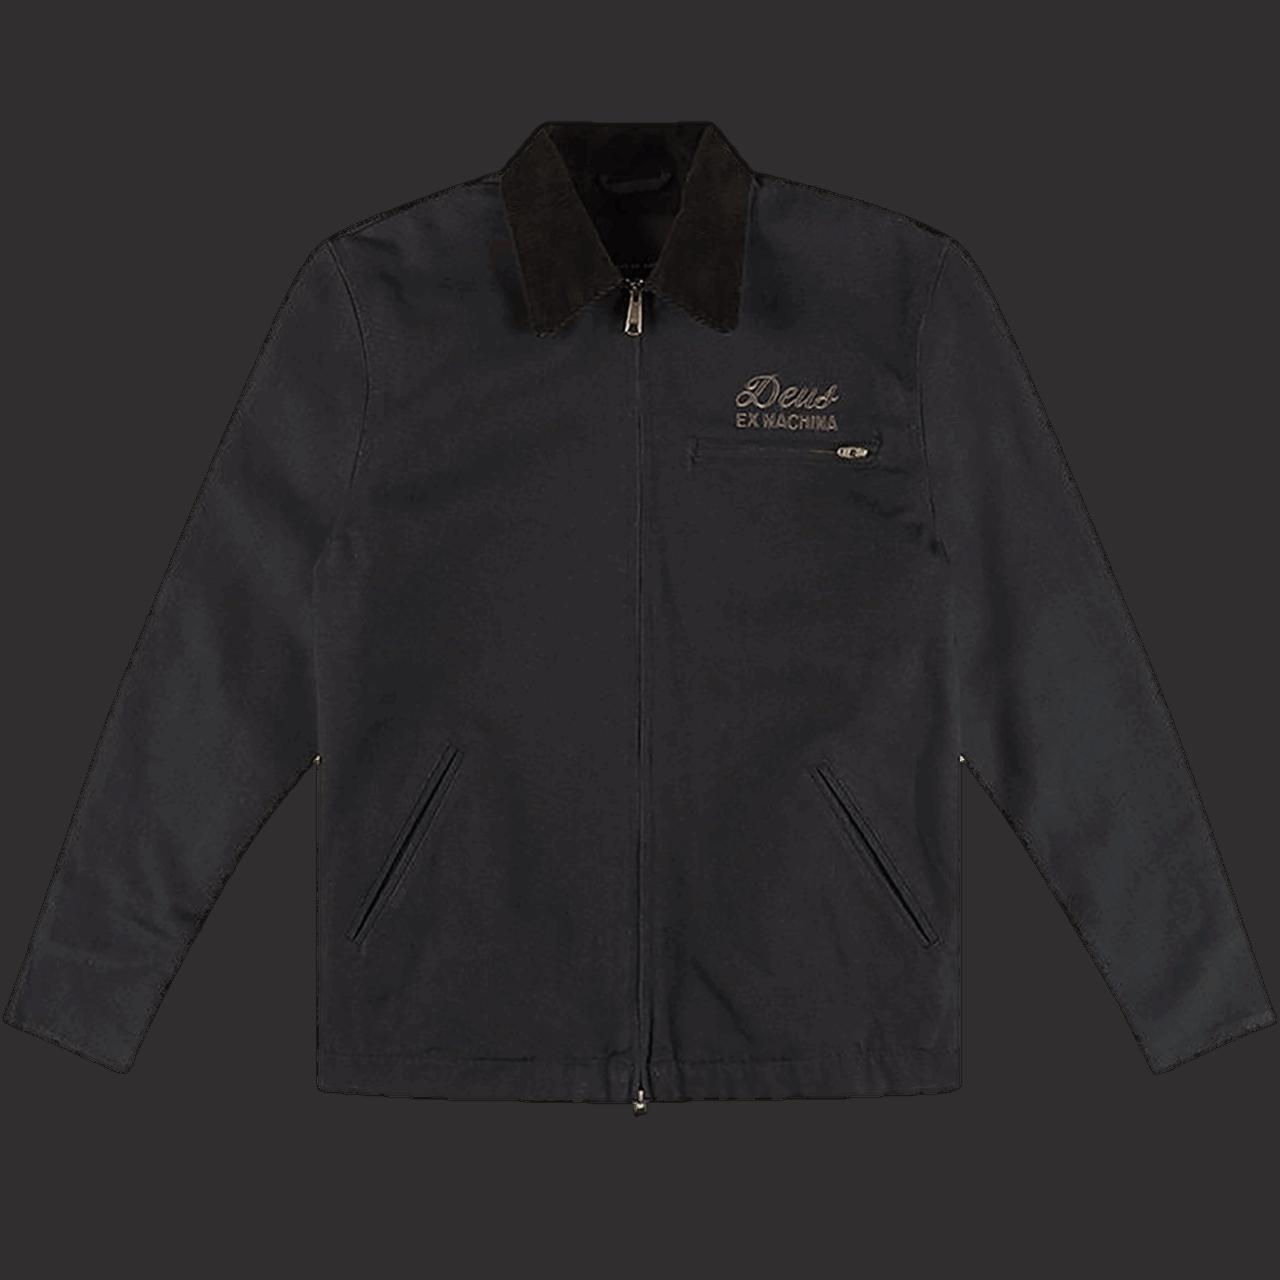 Deus Address Workwear Jacket Black